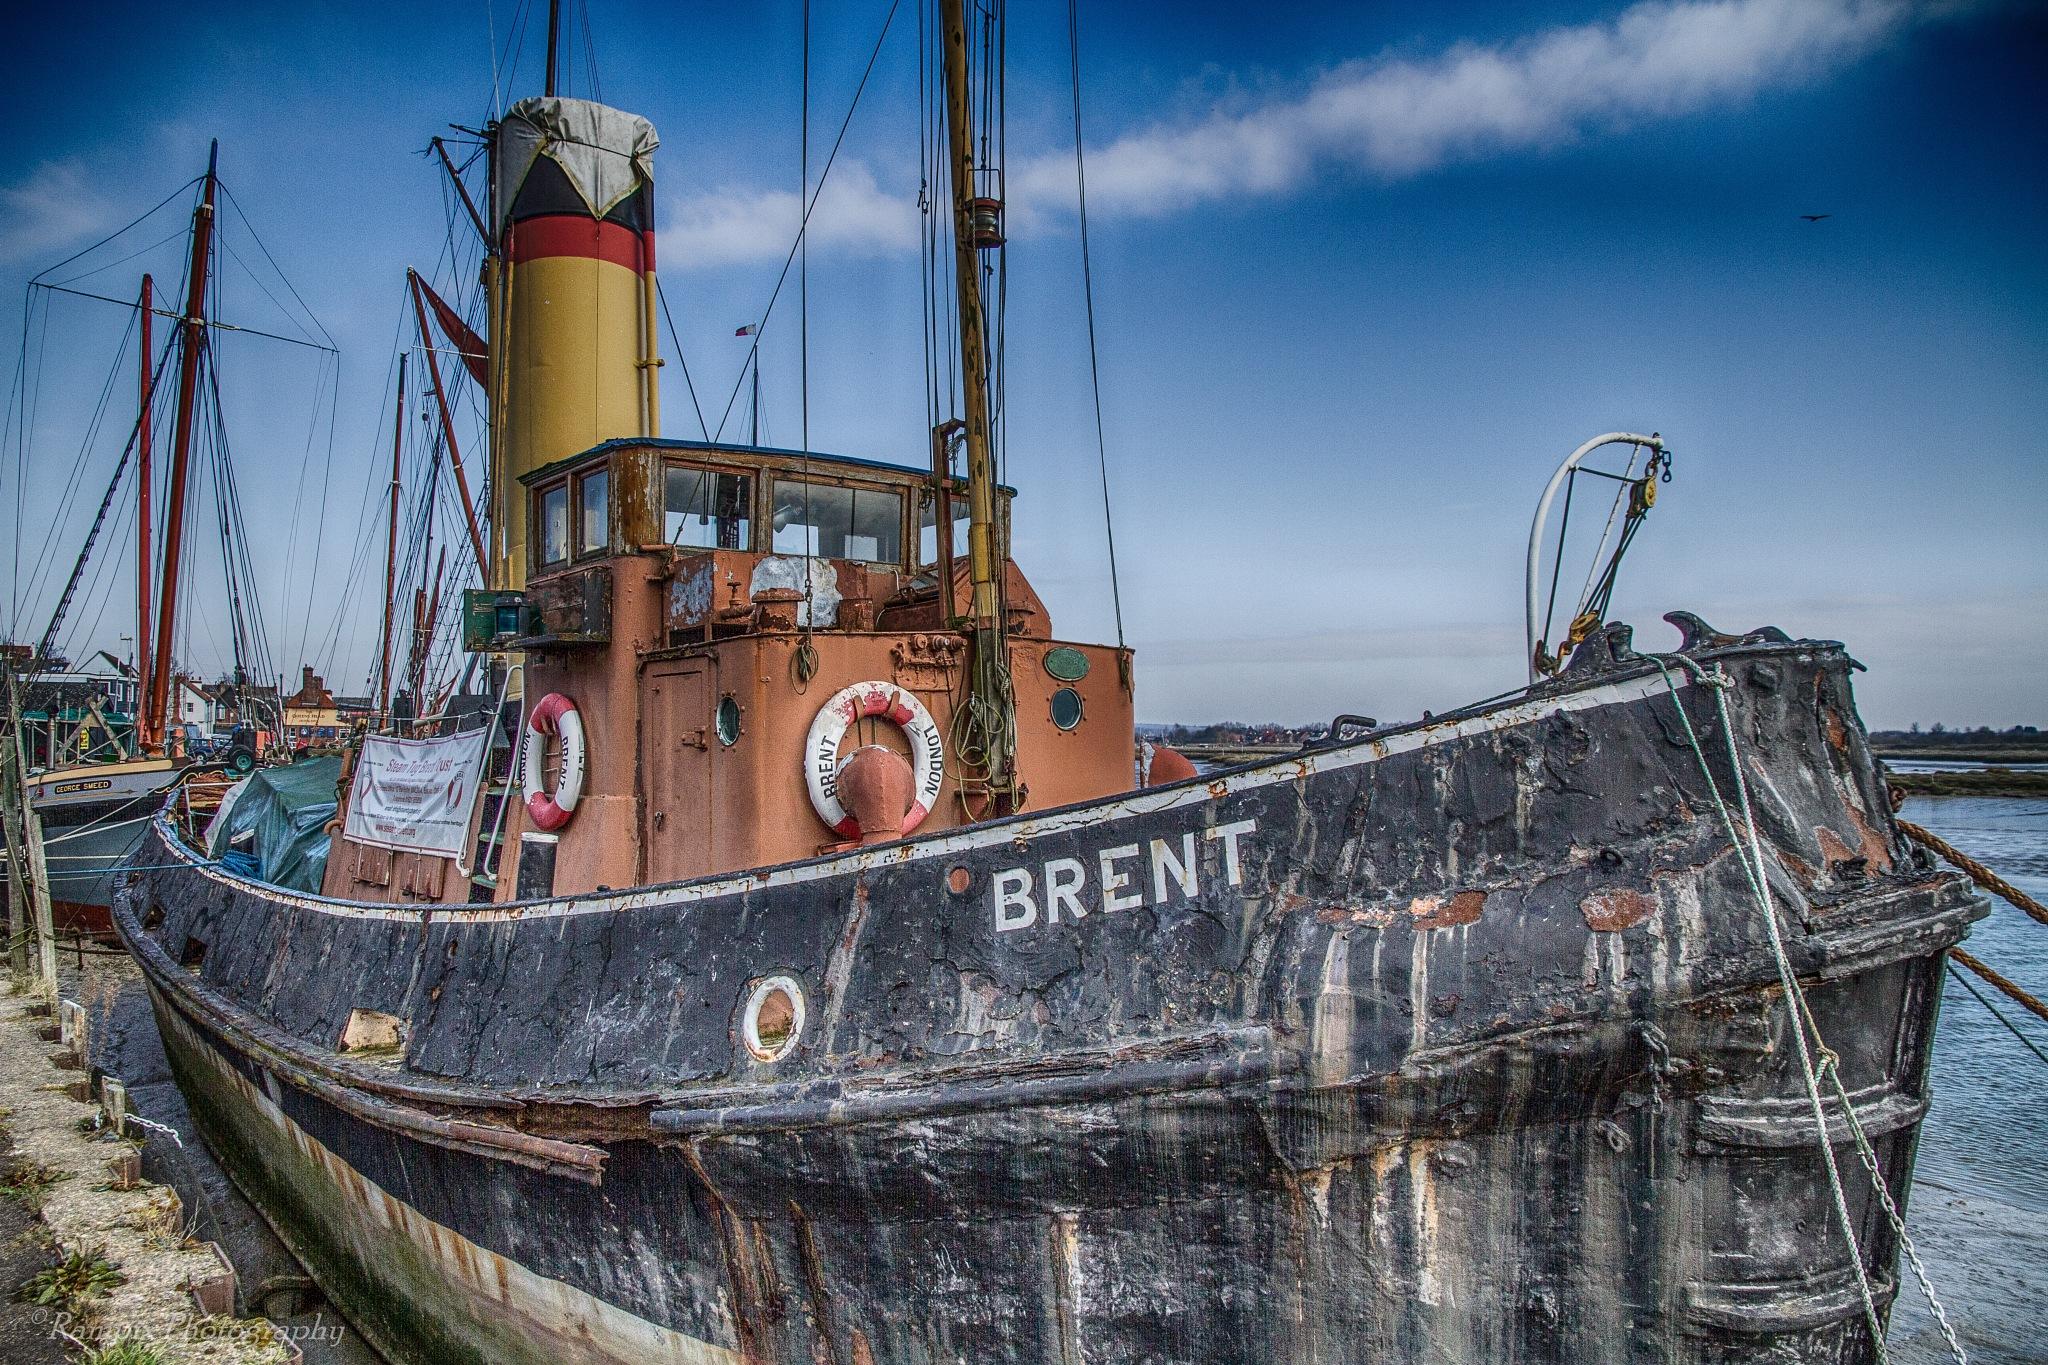 Brent steam tug by Rampix